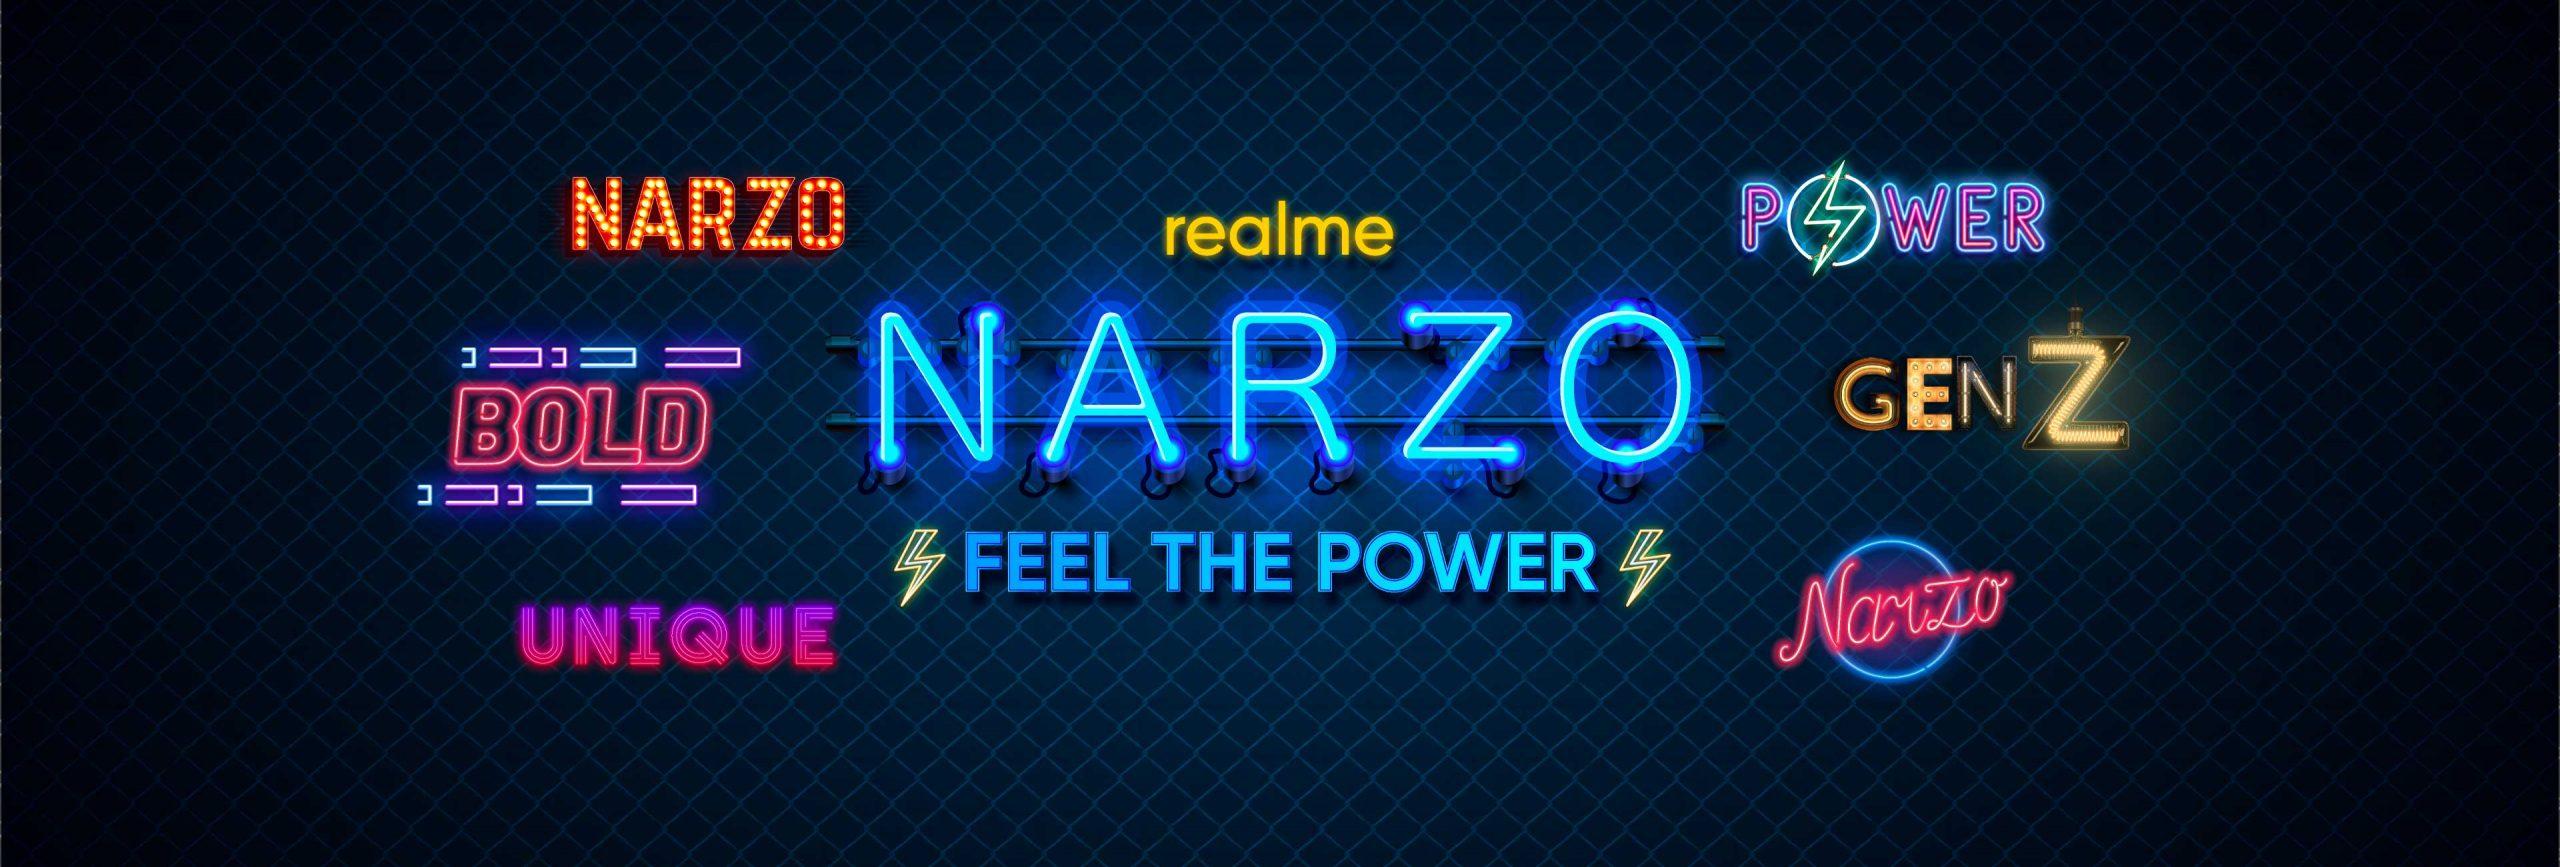 Narzo 20 Series